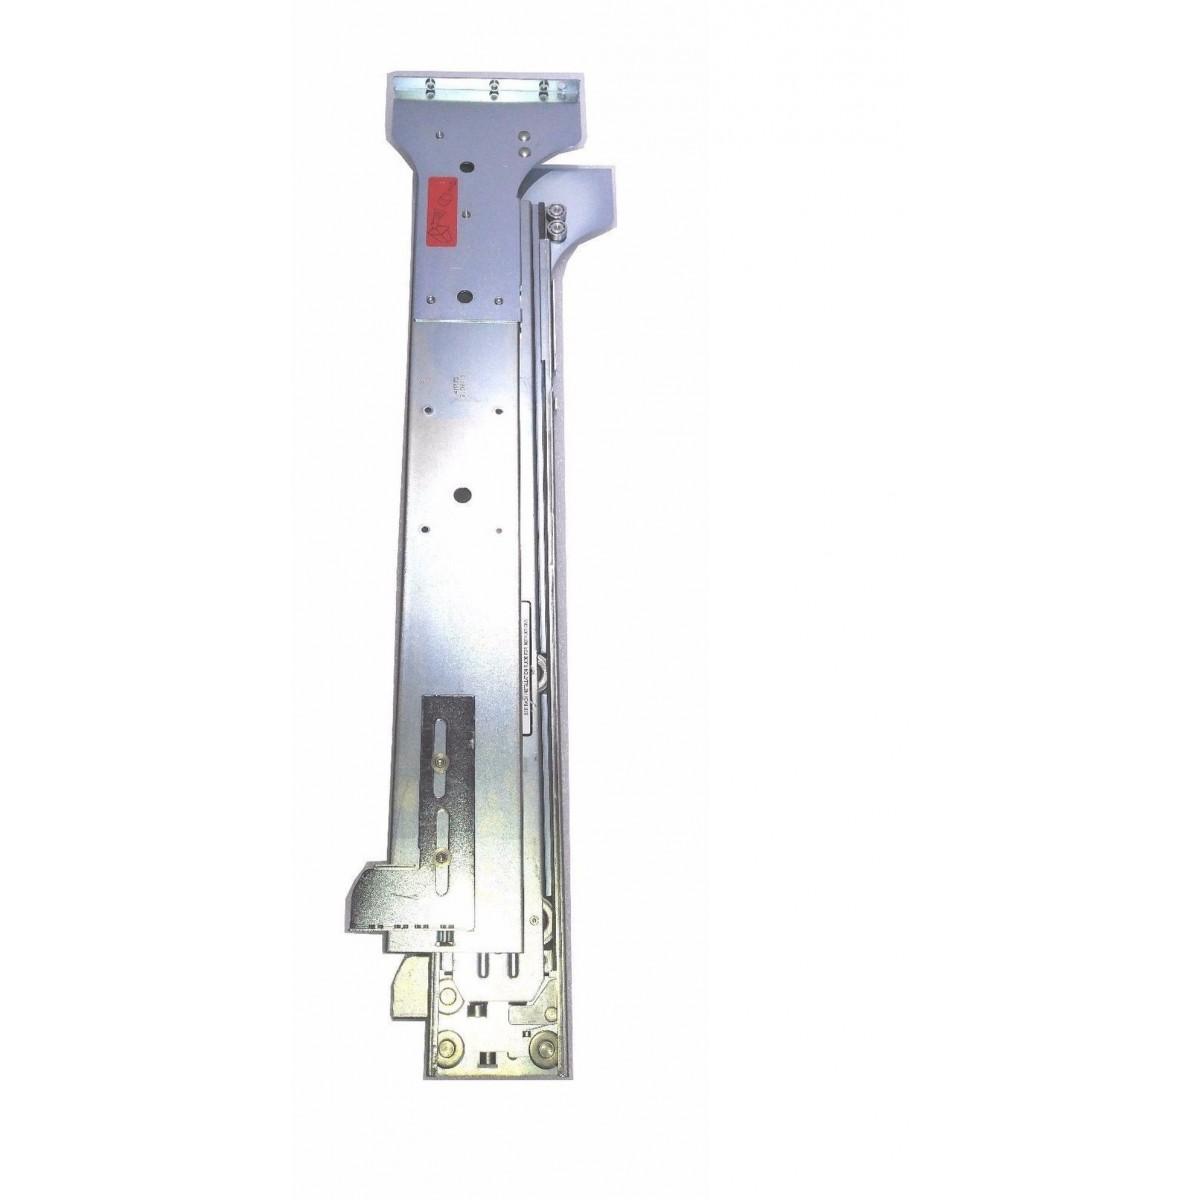 DYSK TWARDY SEAGATE 400GB SAS 10K 3,5 ST3400755SS